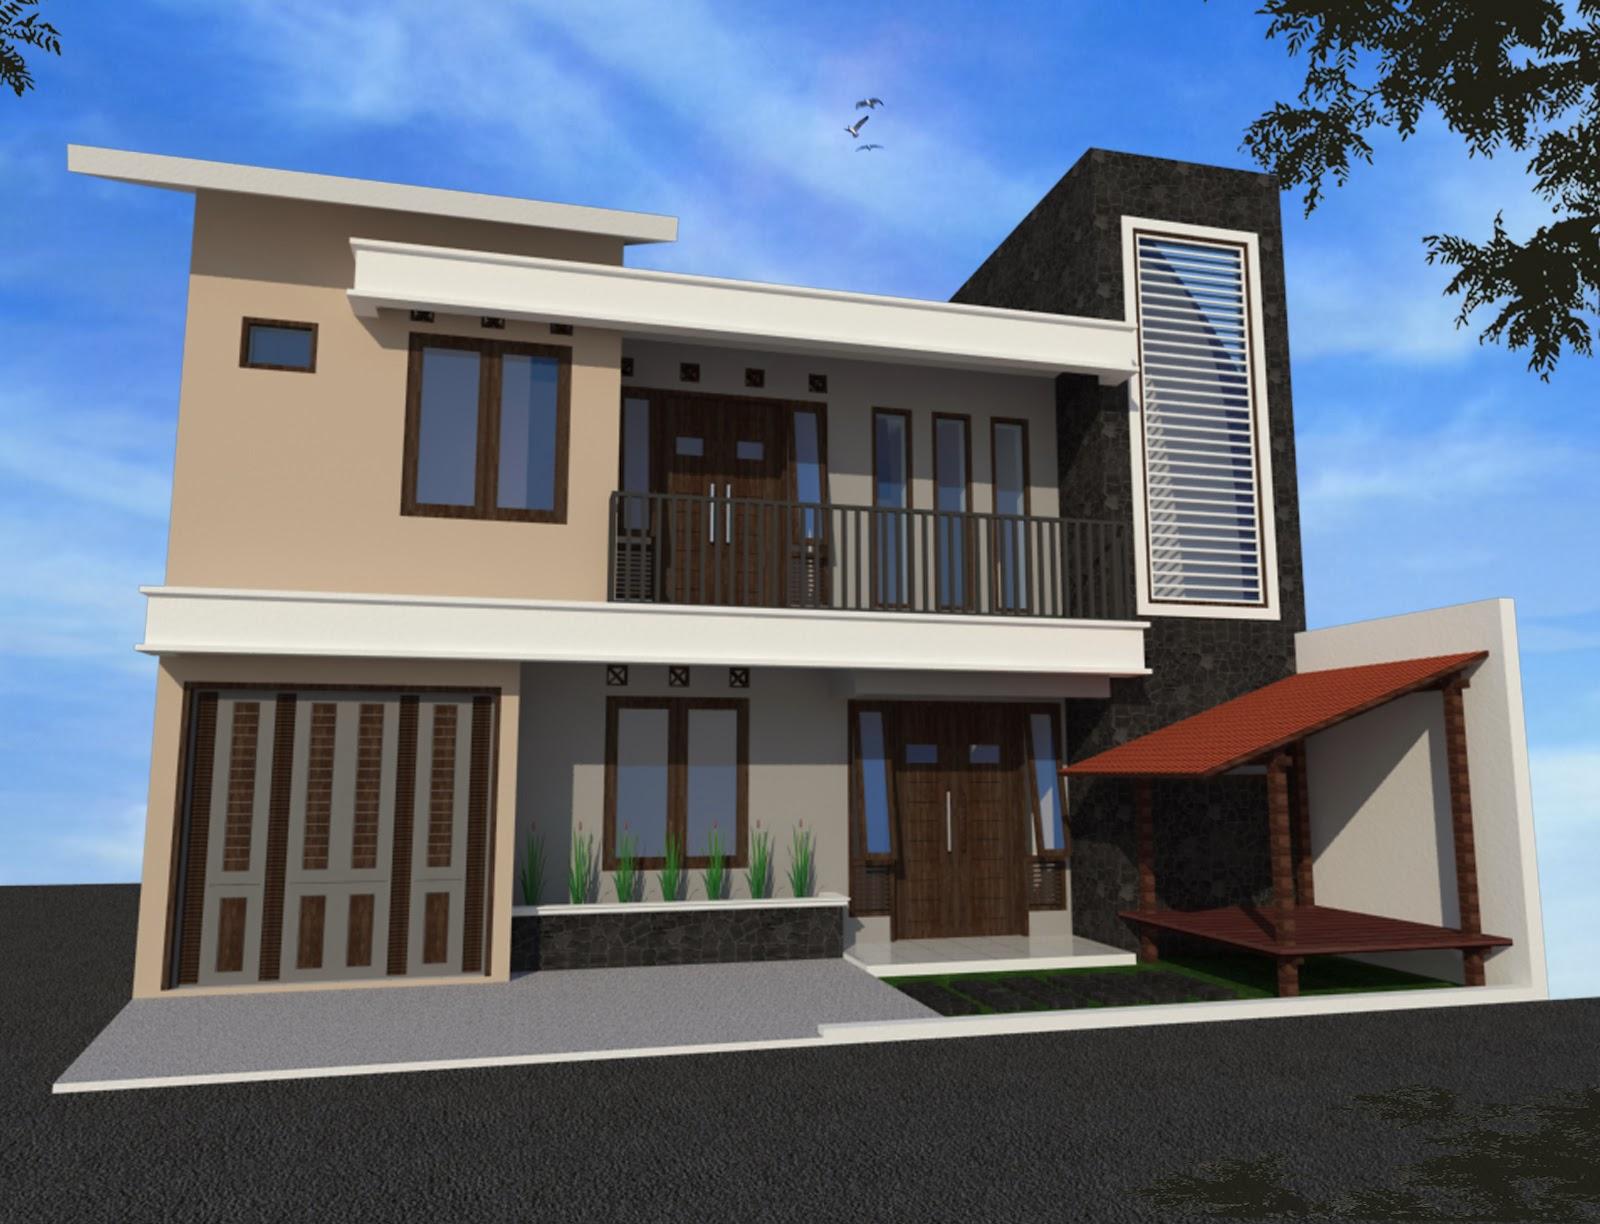 Desain Rumah Minimalis Type 70 2016 Musail 84